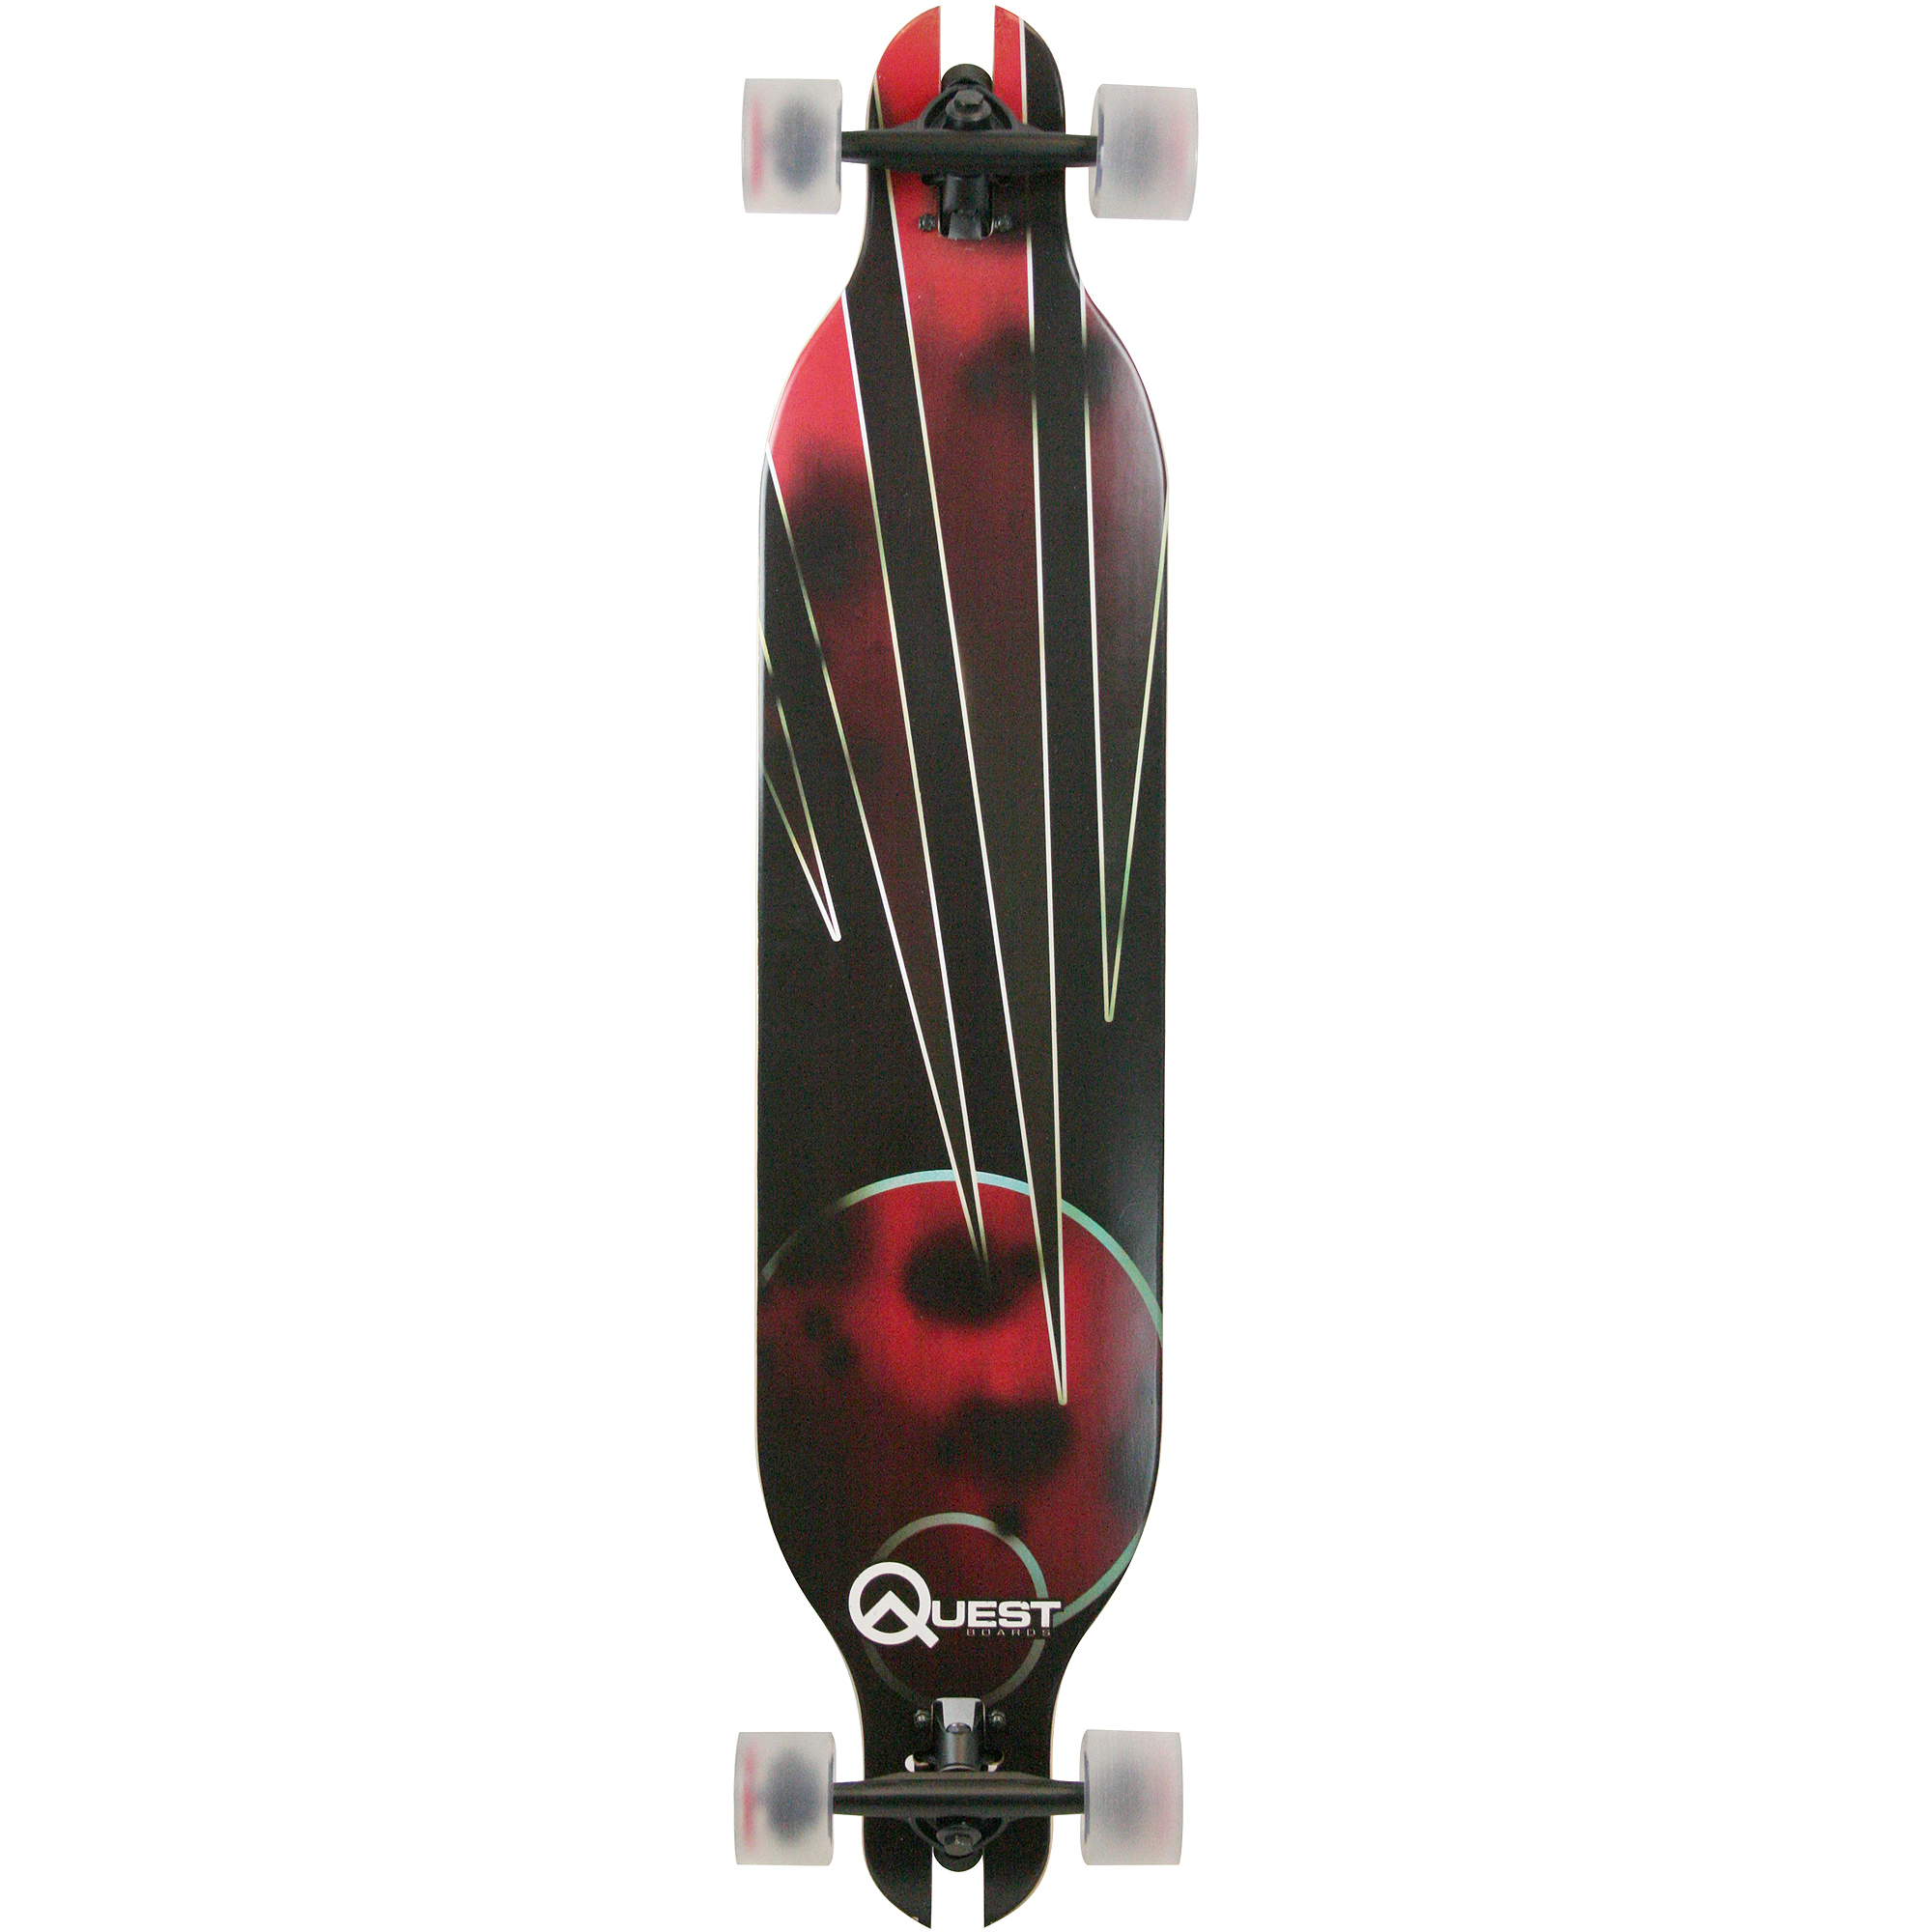 "Quest Mars Slot Through 41"" Longboard Skateboard"